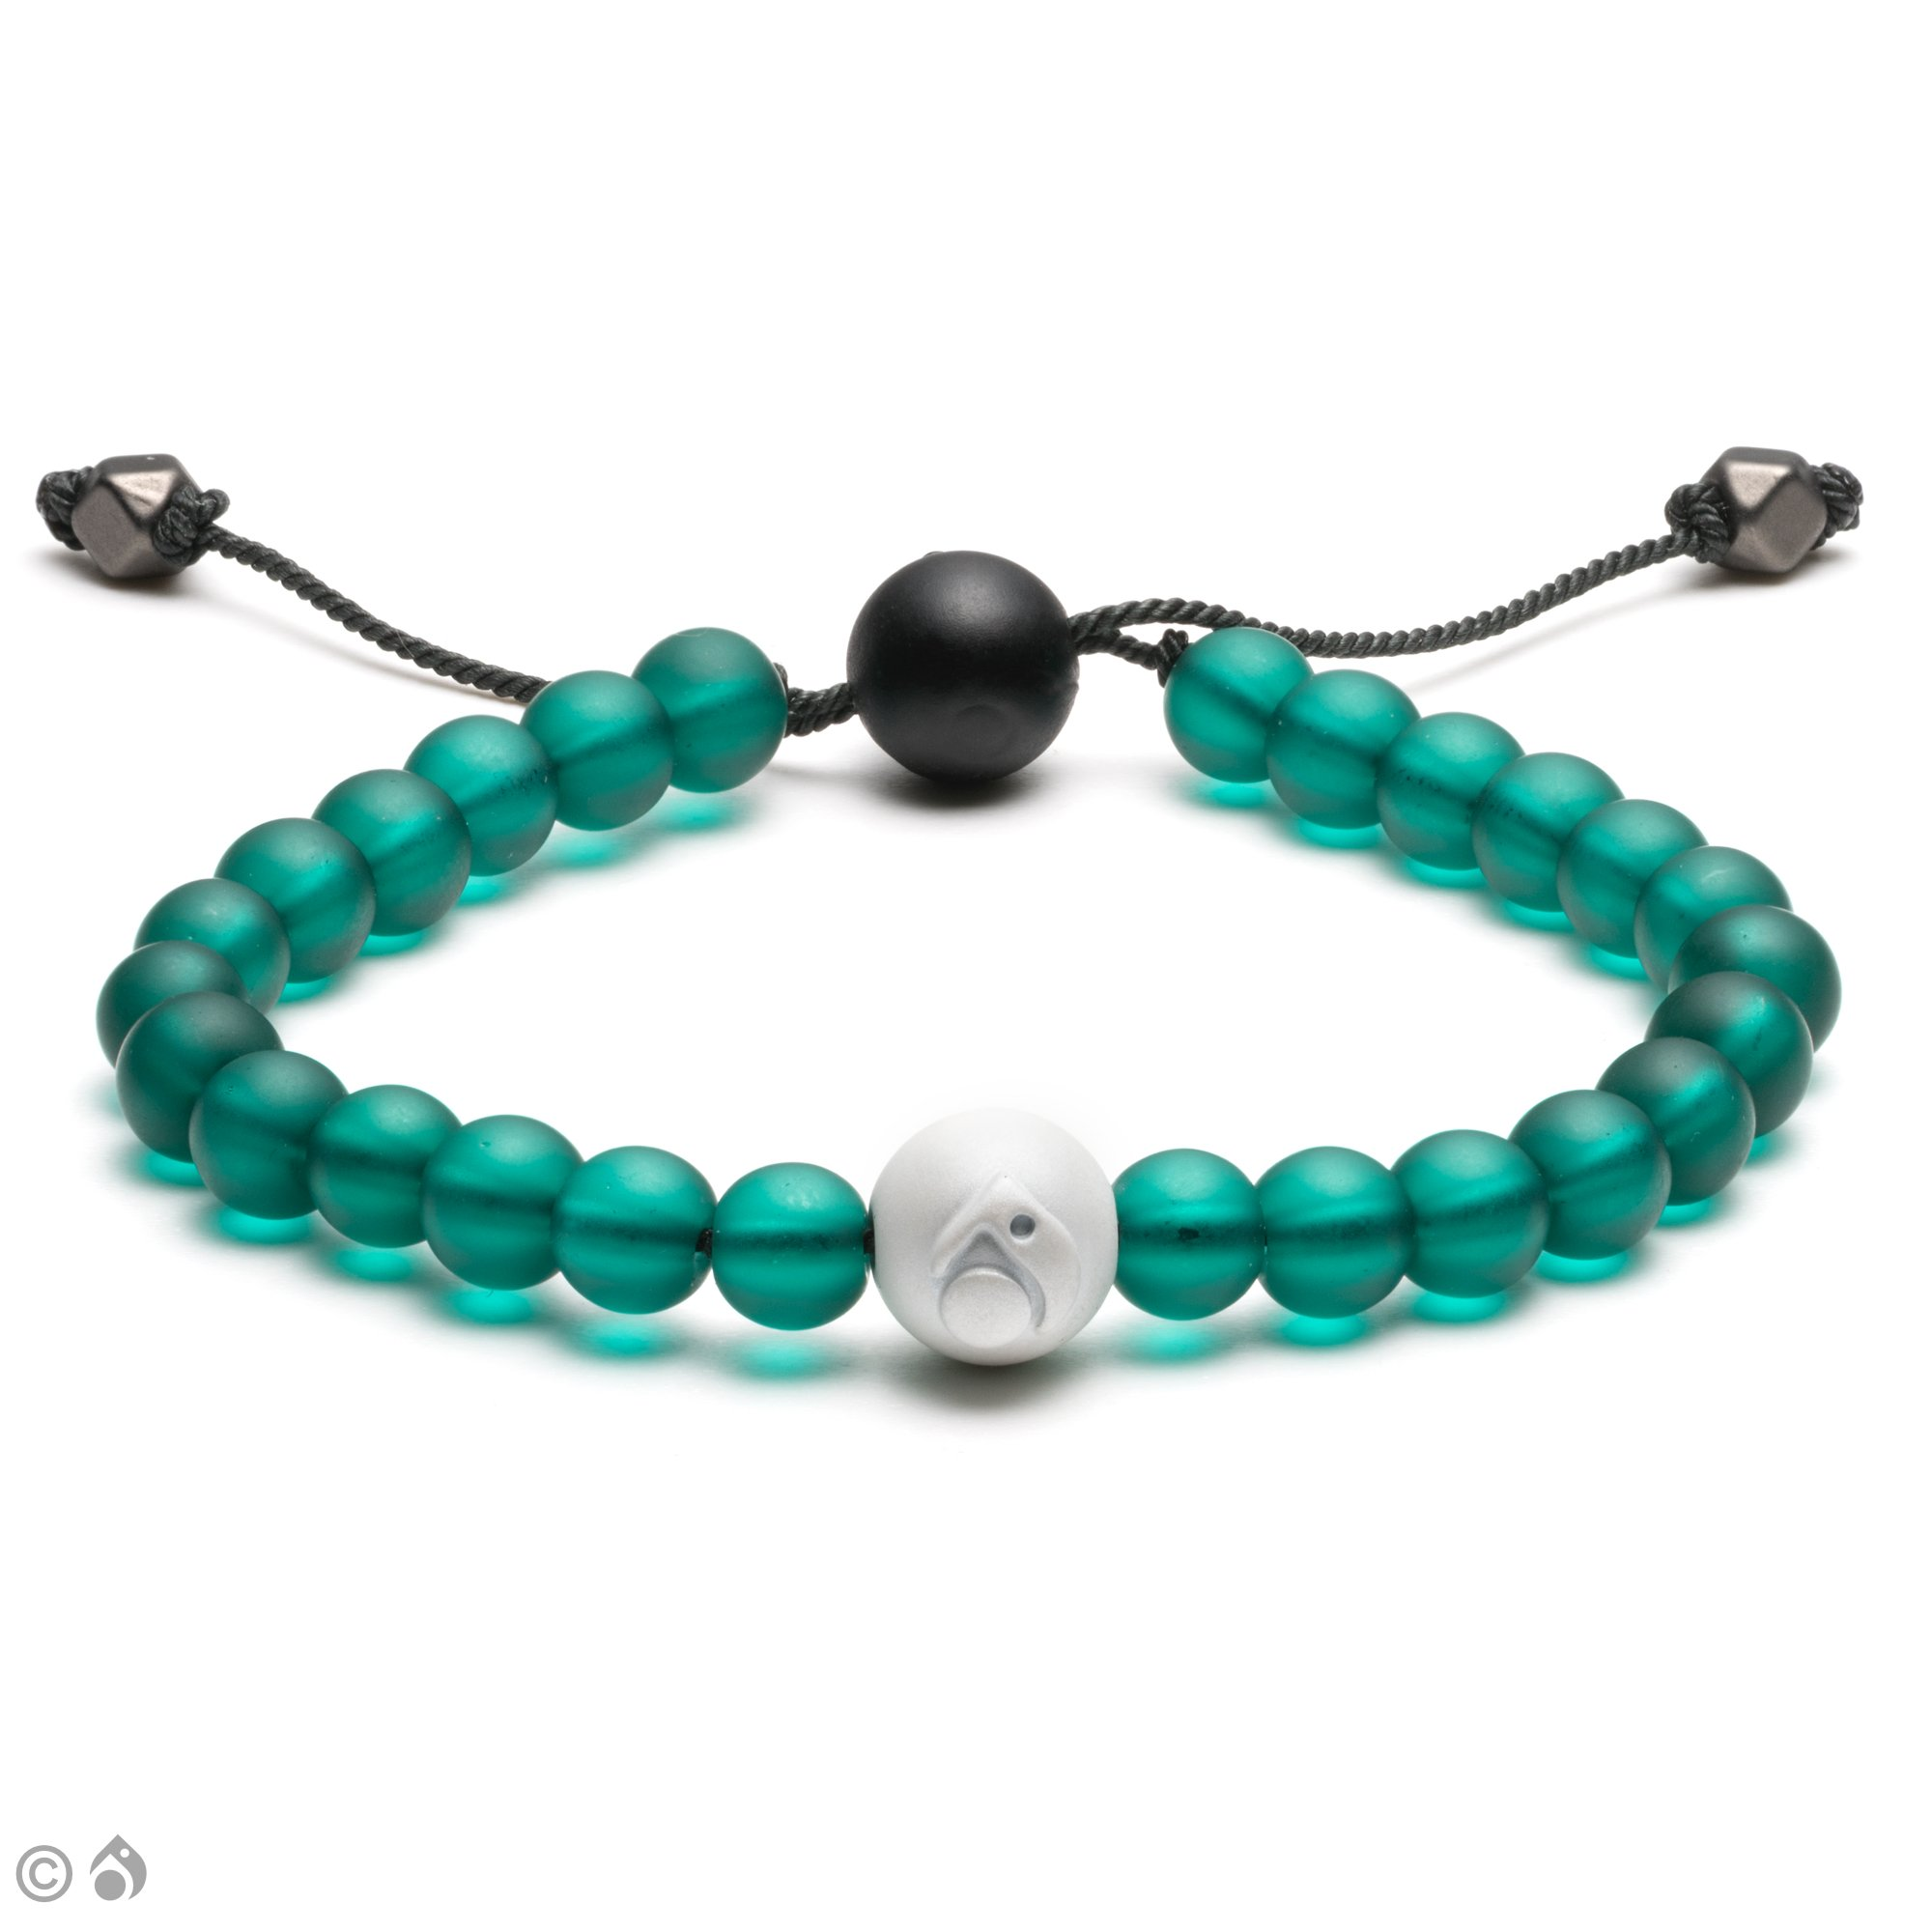 Lokai Forest Glass Bead Bracelet - Size Small/Medium